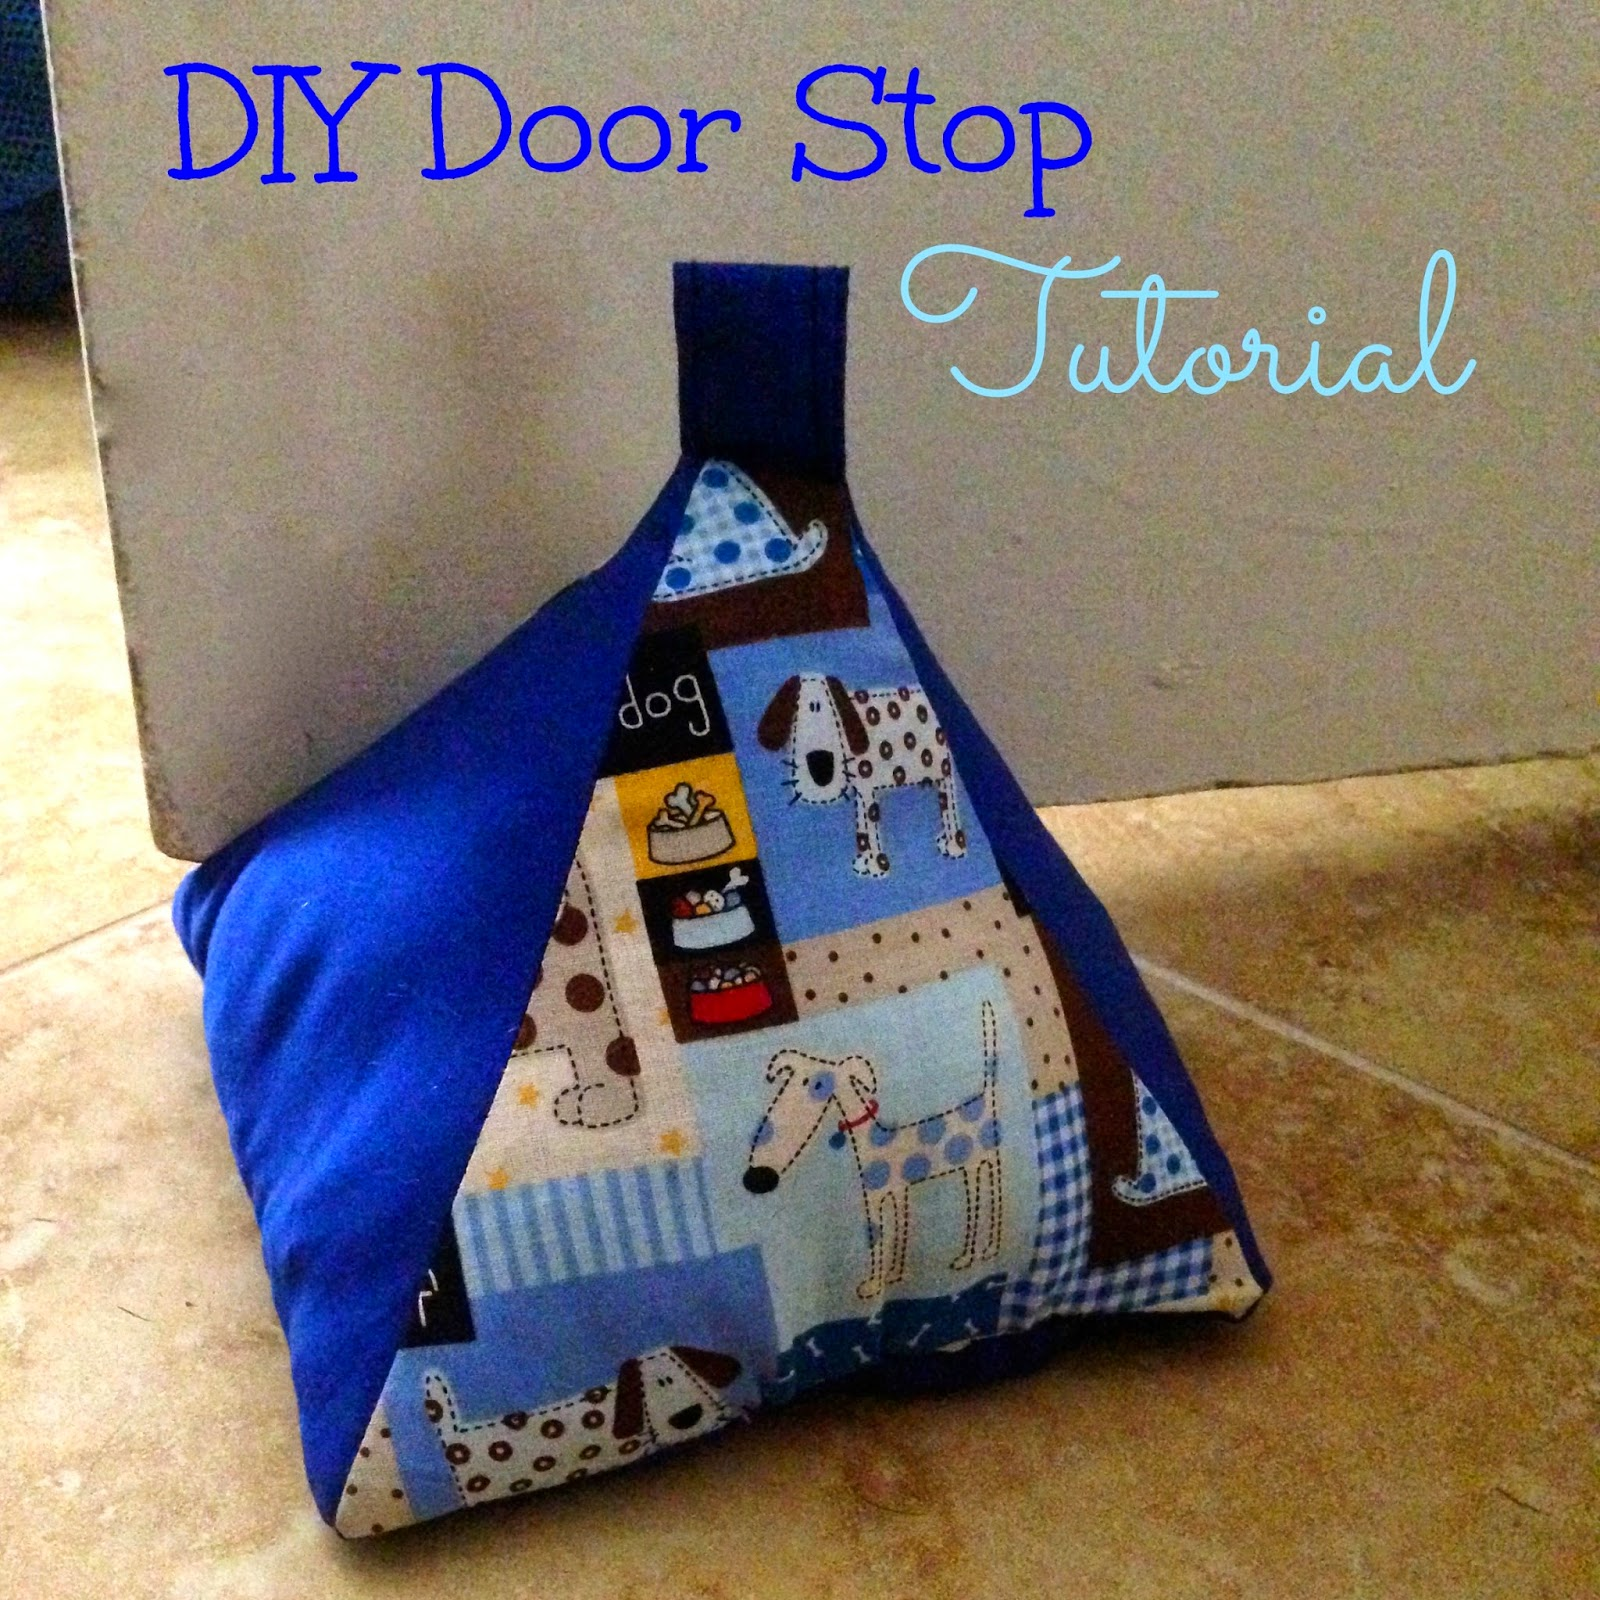 diy door stop tutorial tulips orchids bloglovin 39. Black Bedroom Furniture Sets. Home Design Ideas